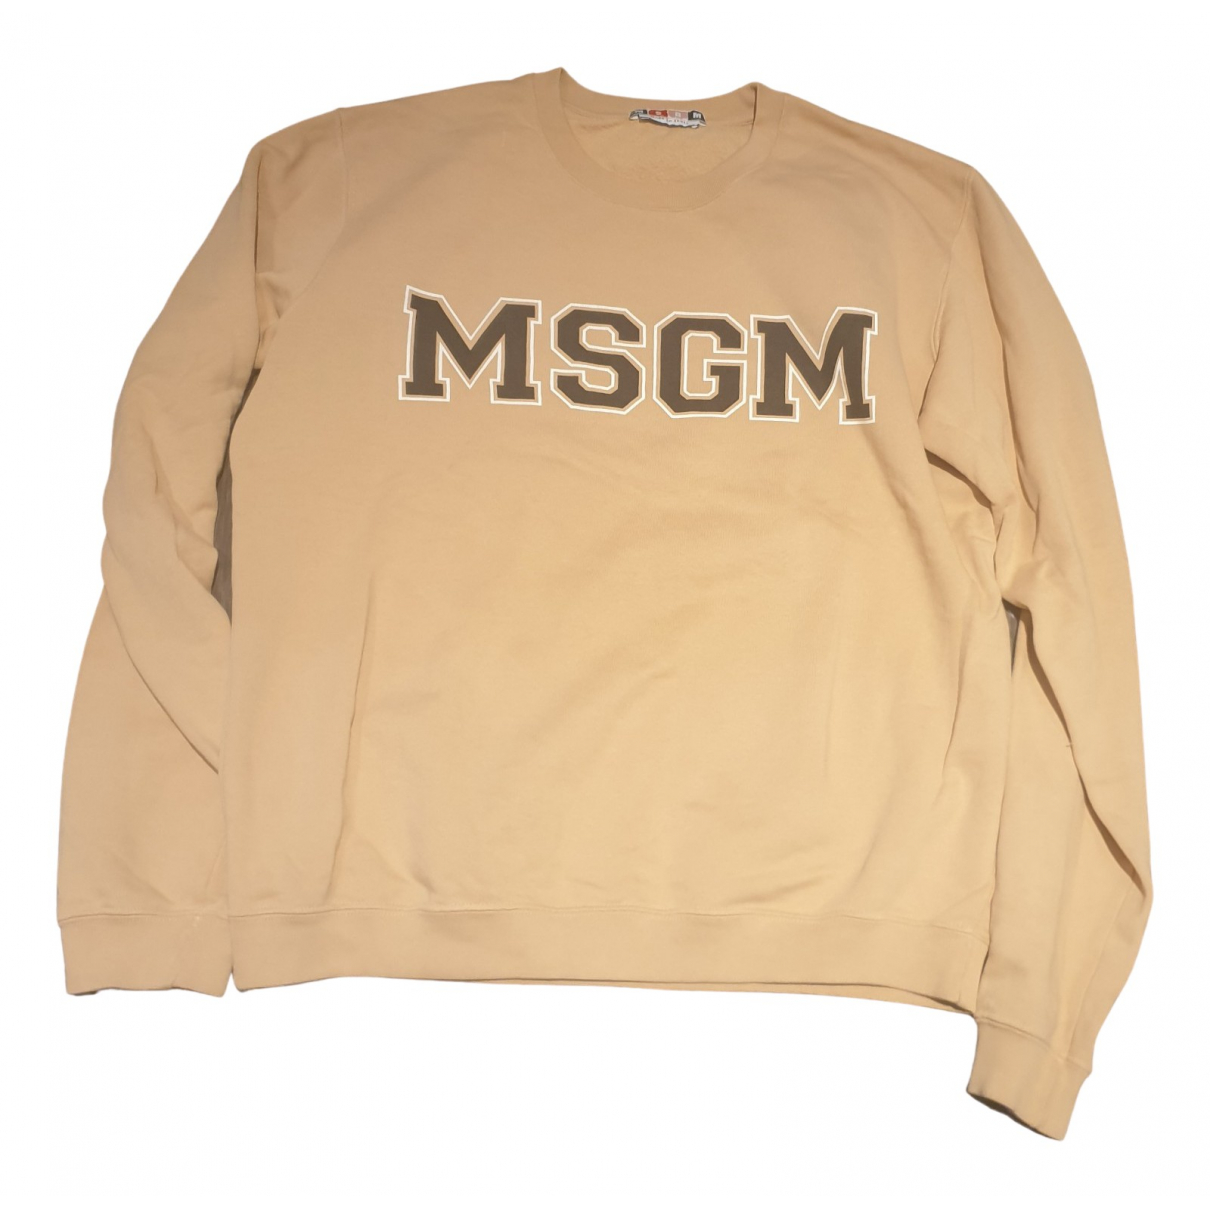 Msgm N Camel Cotton Knitwear & Sweatshirts for Men L International